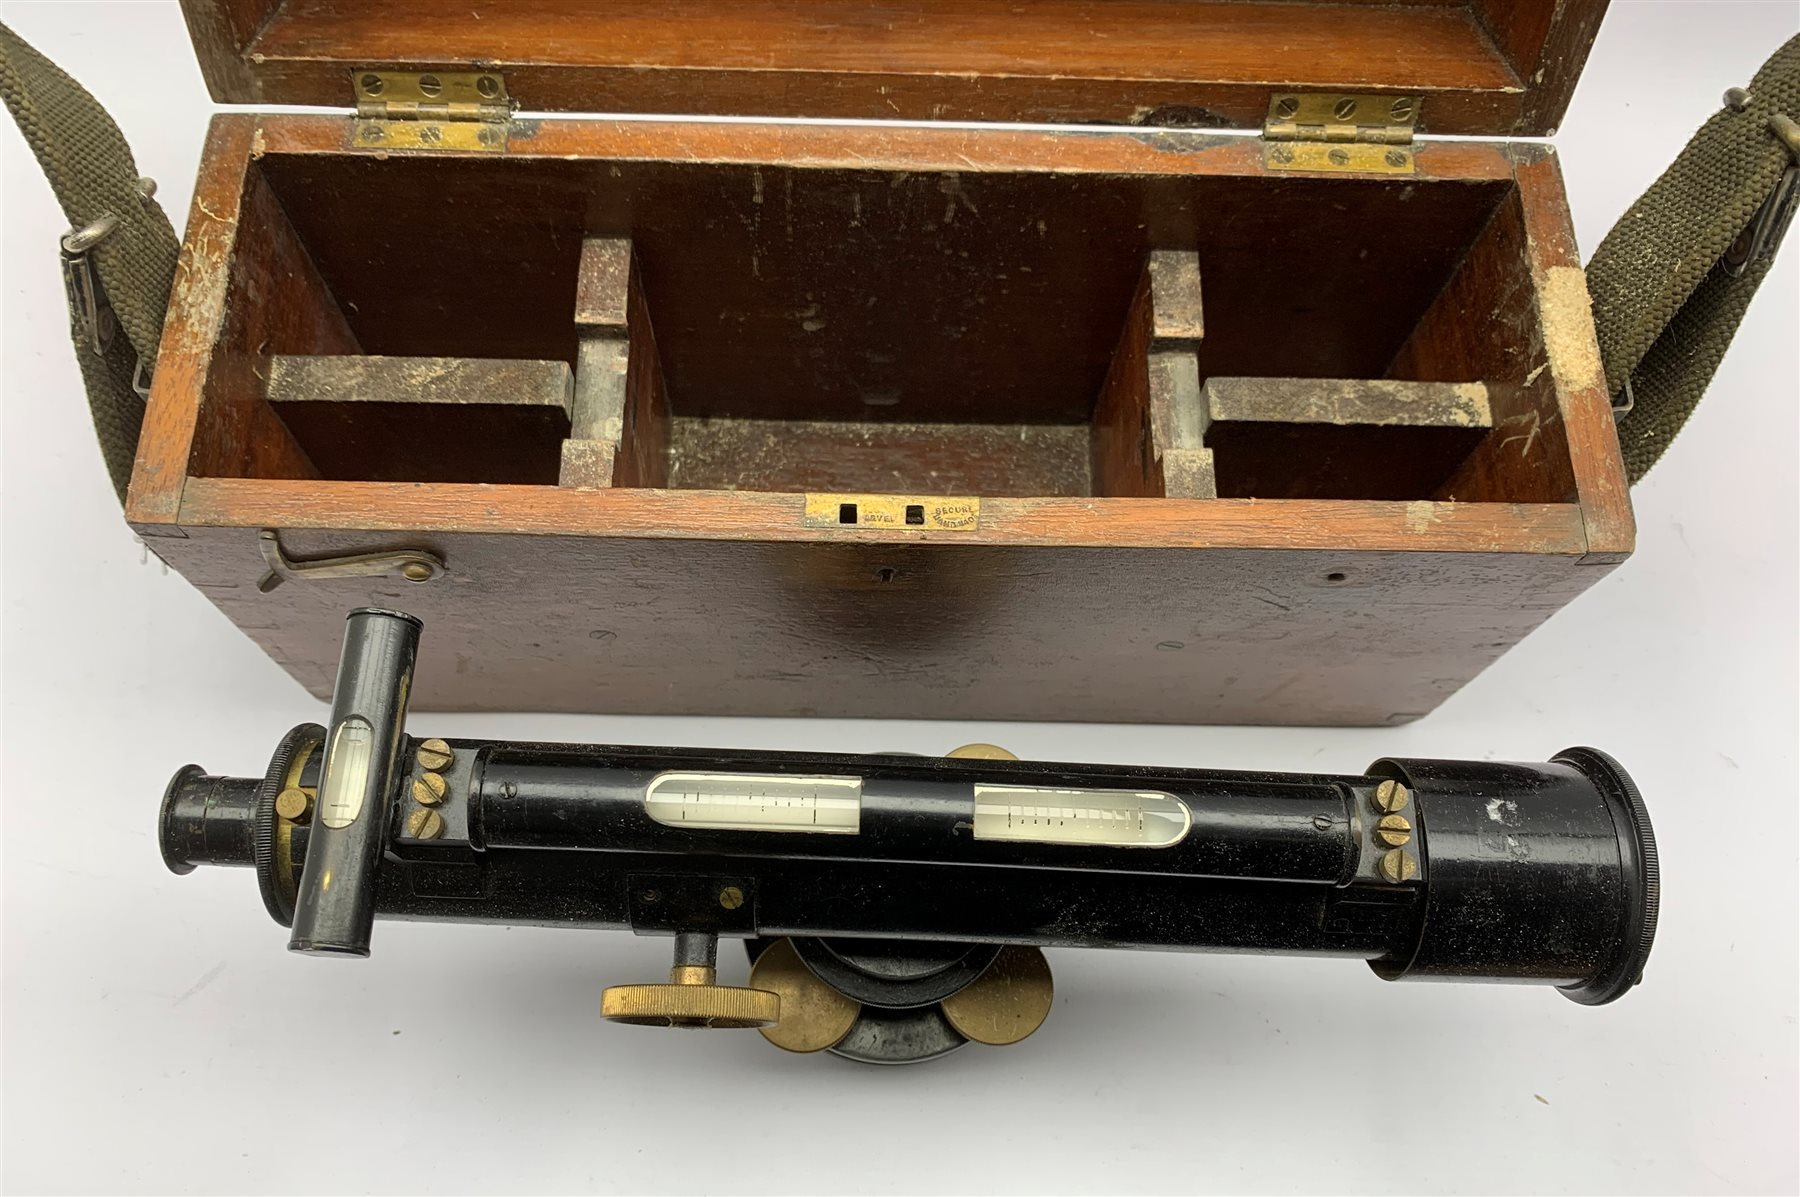 Theodolite by J Halden & Co Ltd Manchester & London theodolite, in wooden case - Image 2 of 3